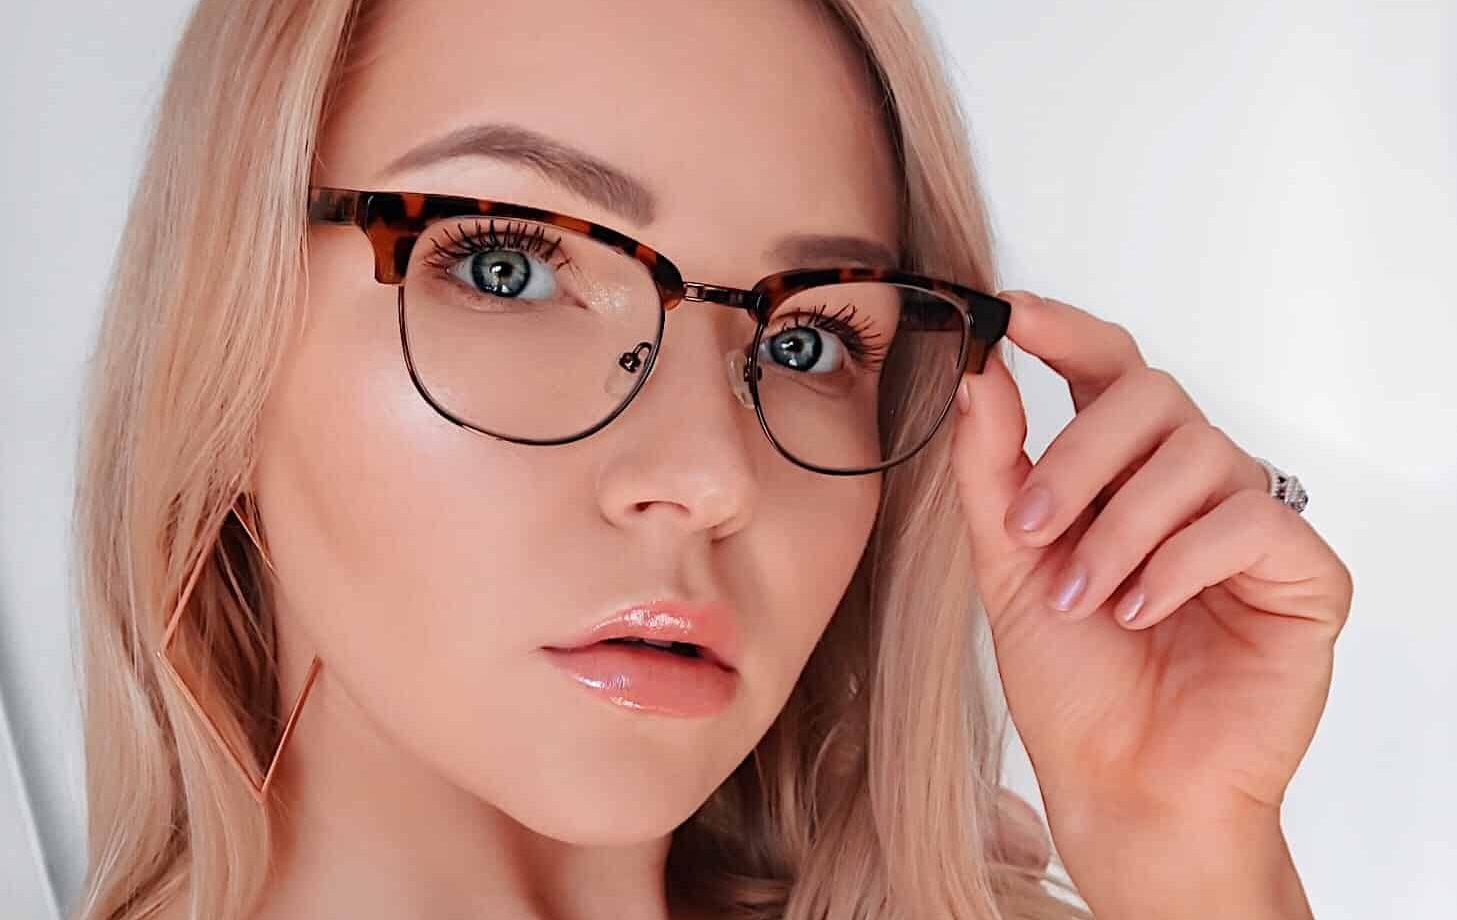 EXYRA Blue-Light Eyewear